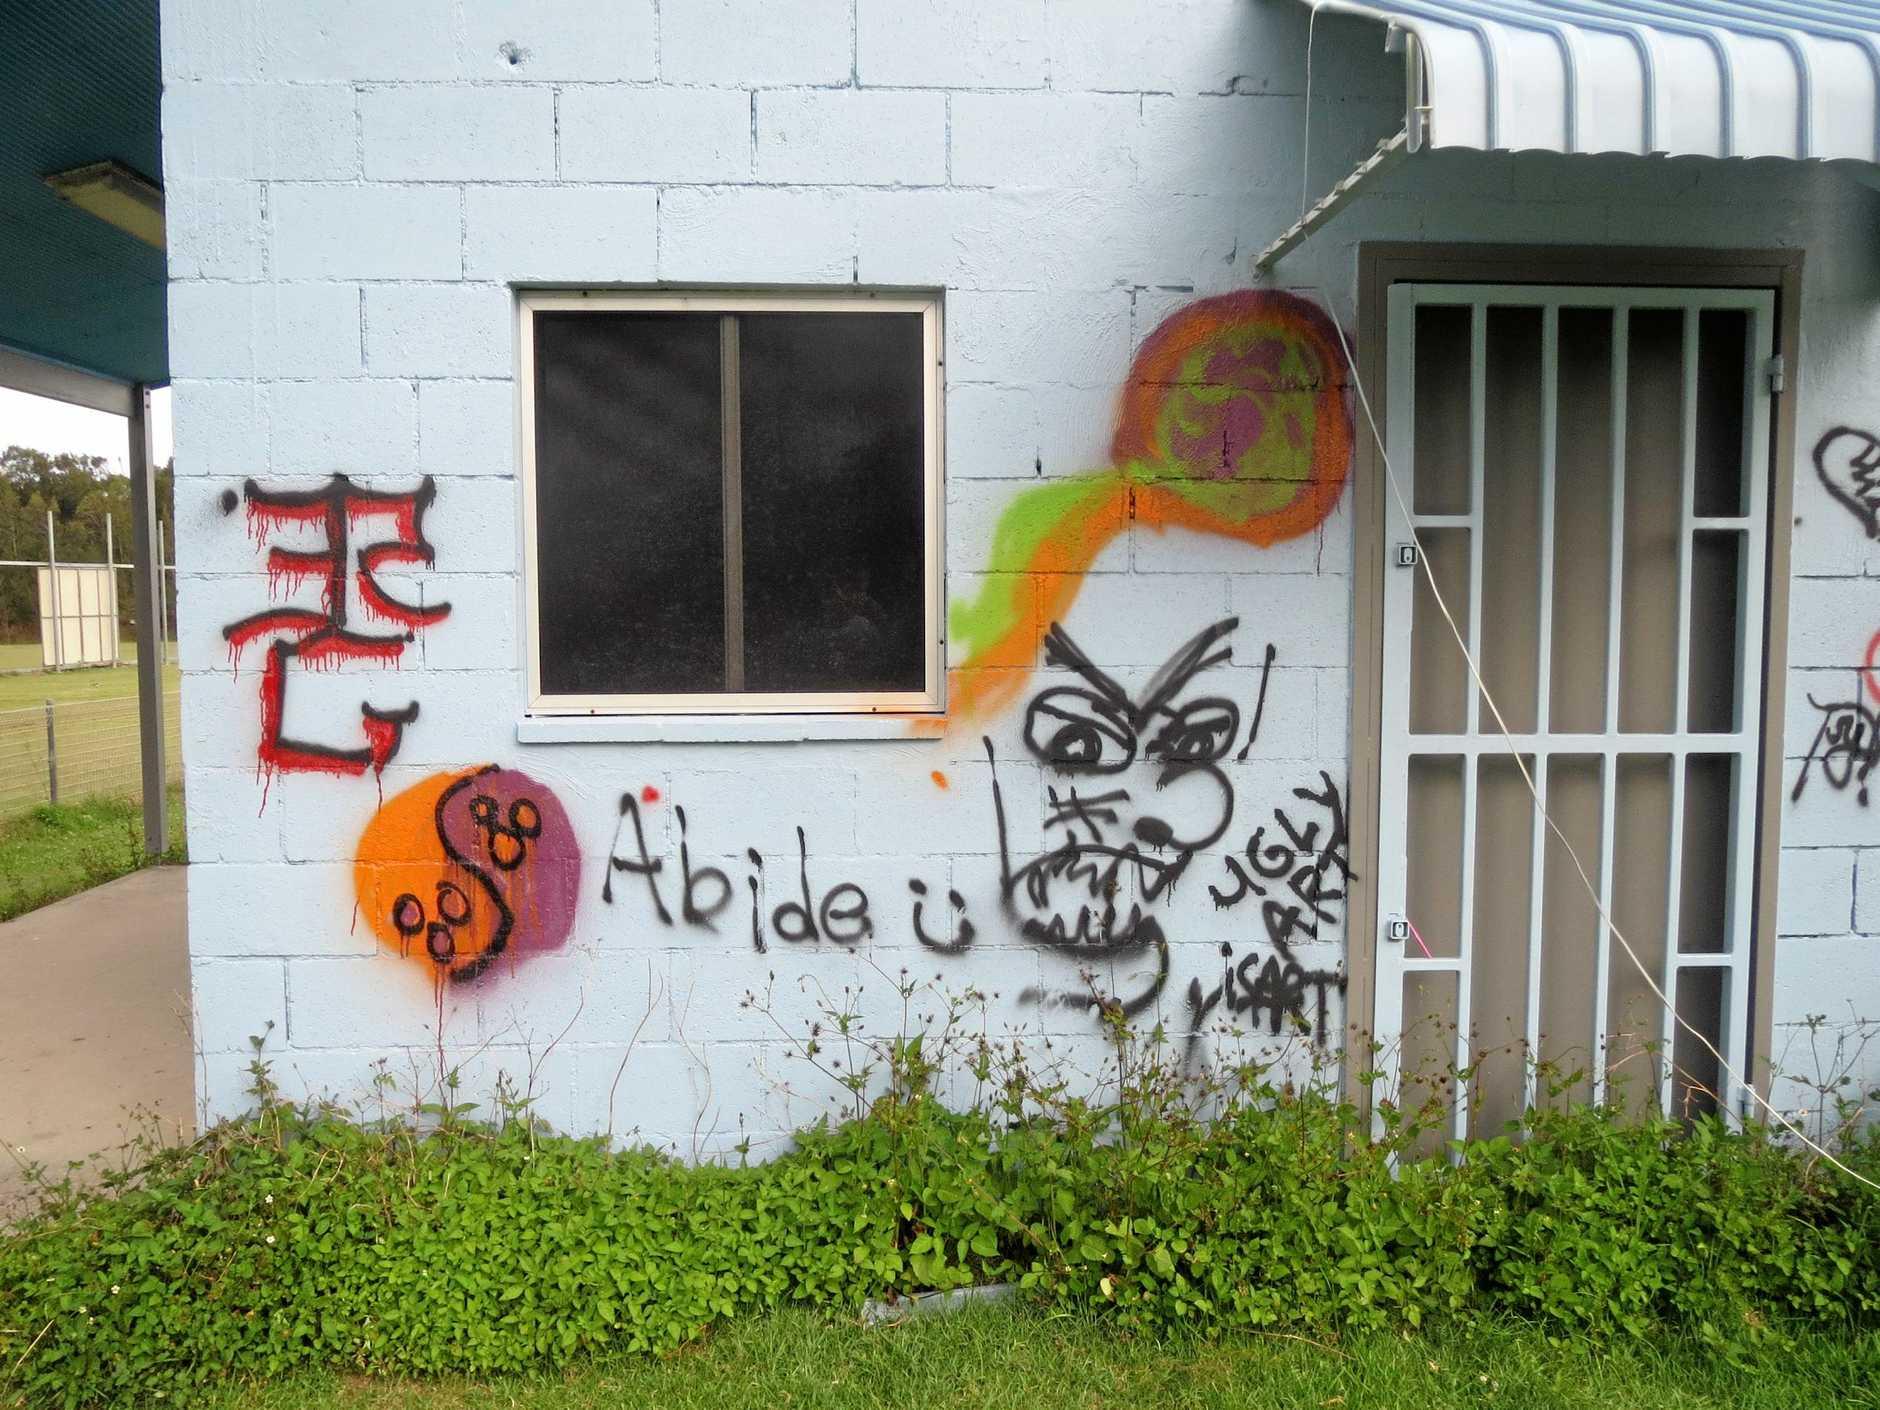 Sports Council, police seek perpetrator of graffiti damage.